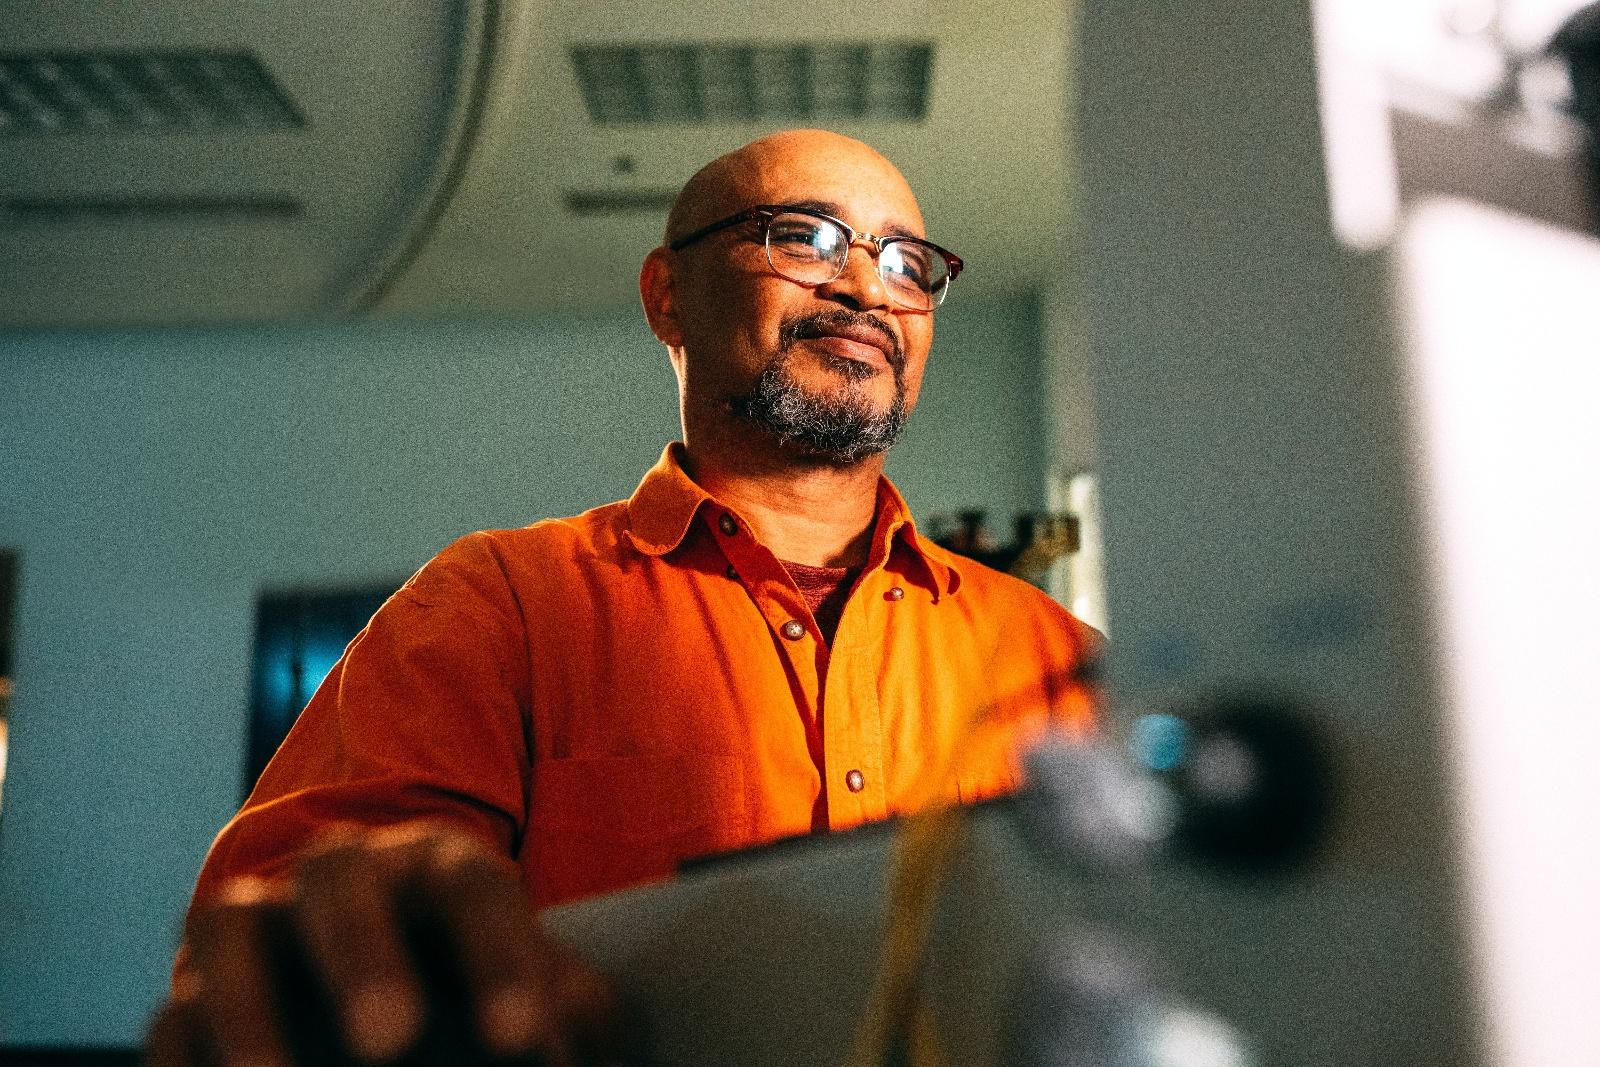 guy in orange shirt in front of computer